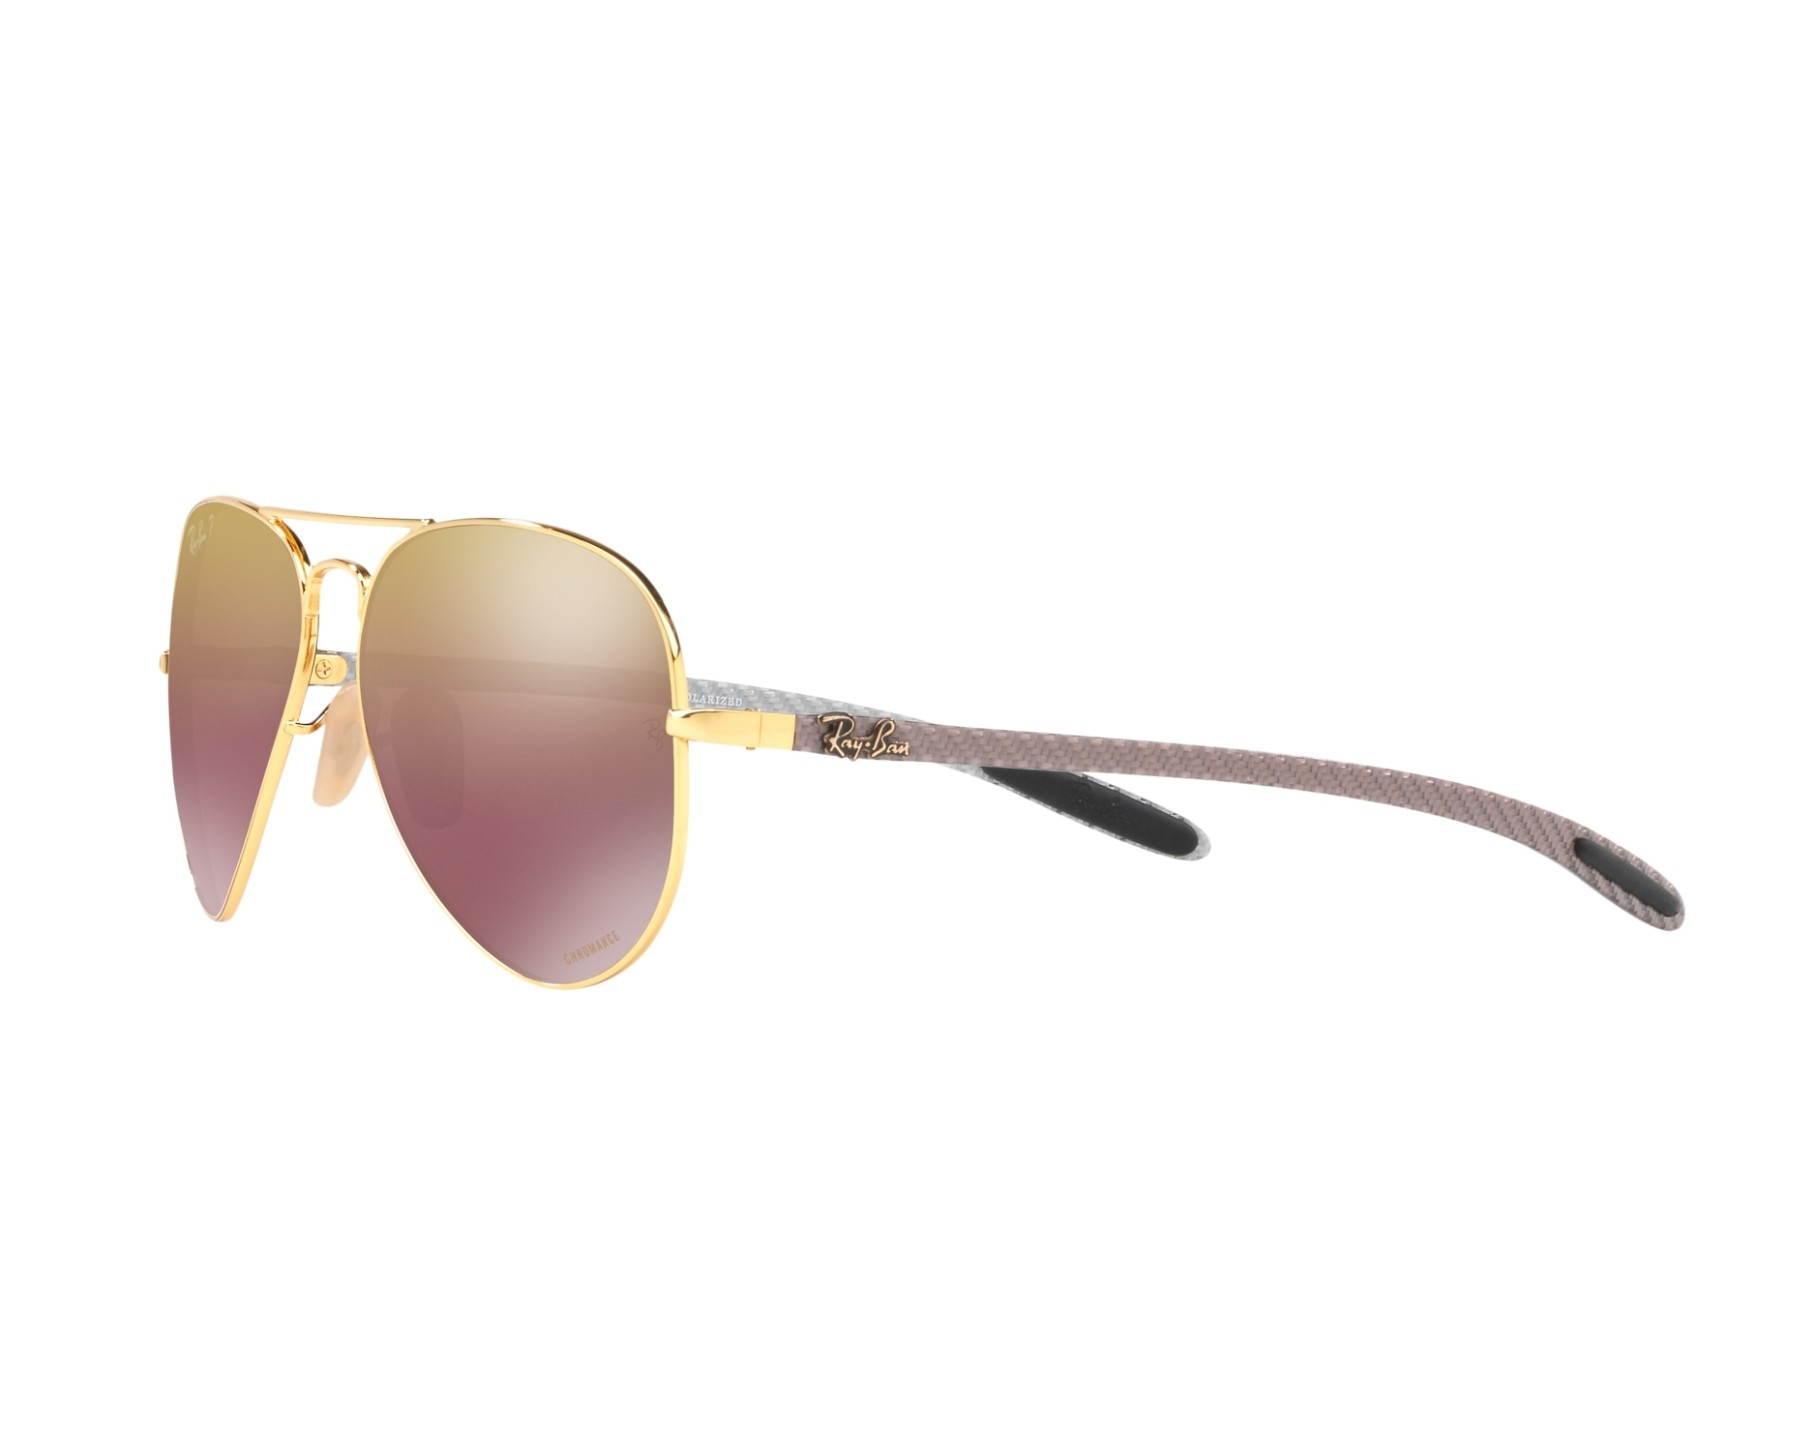 29e35c44be Sunglasses Ray-Ban RB-8317-CH 001 6B 58-14 Gold